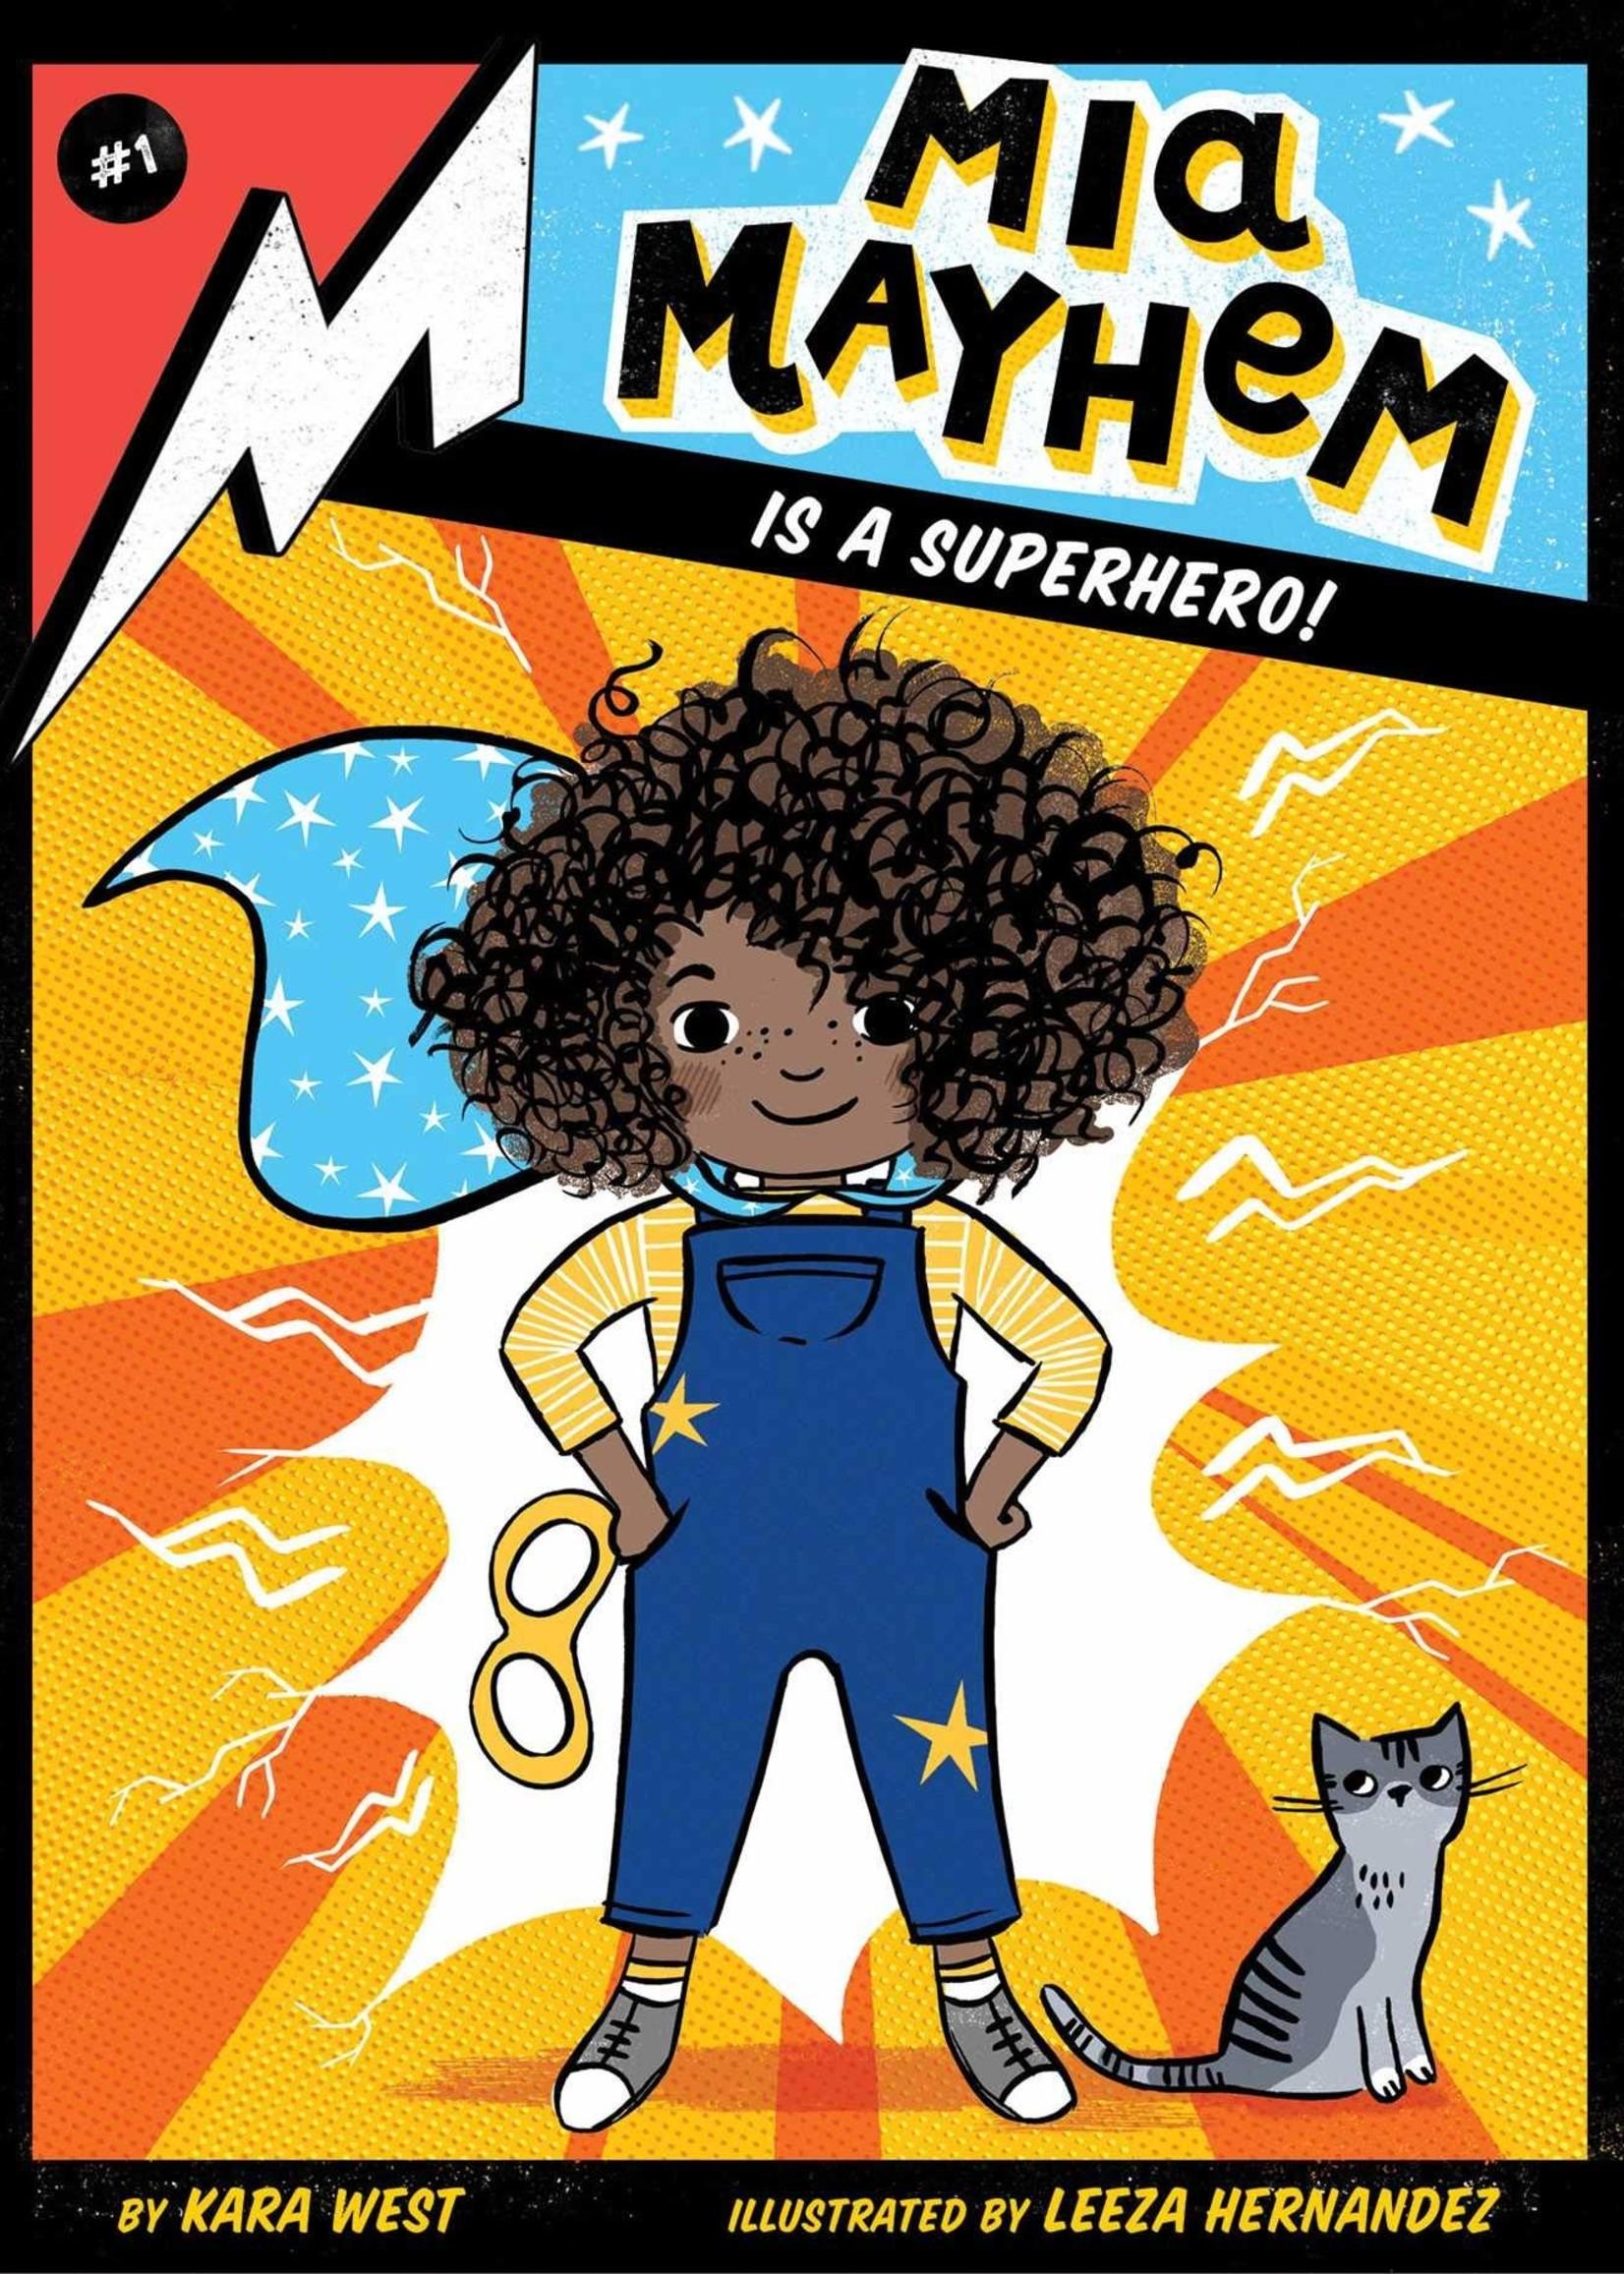 MIA Mayhem #01, Mia Mayhem Is a Superhero! - Paperback